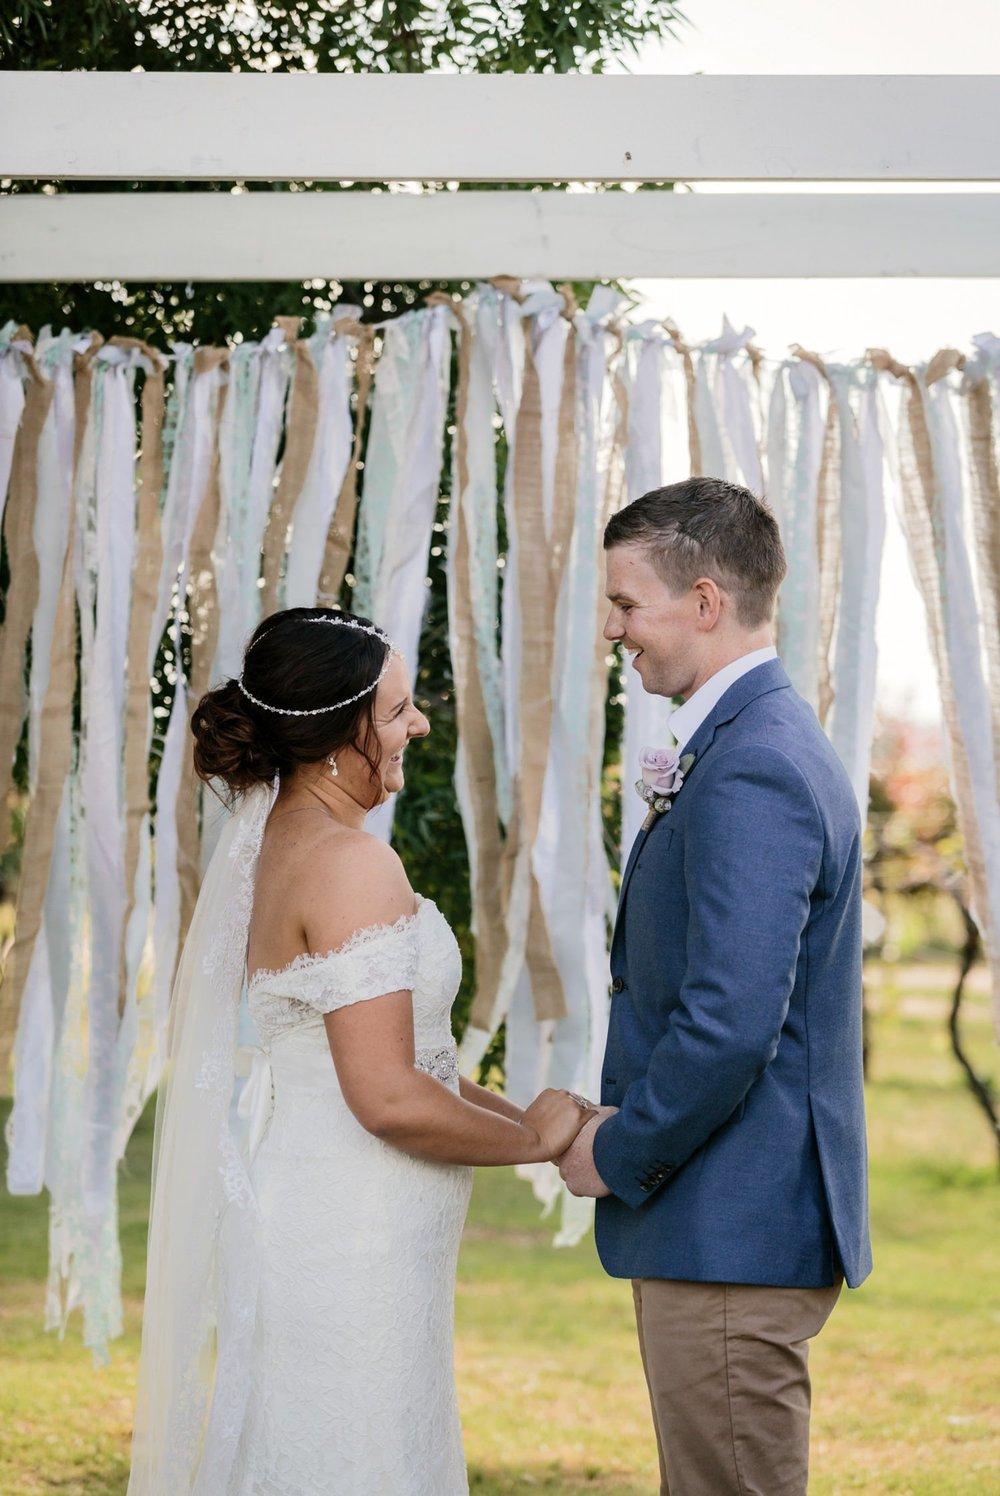 troy emma blue wren winery mudgee wedding photographer 26.jpg